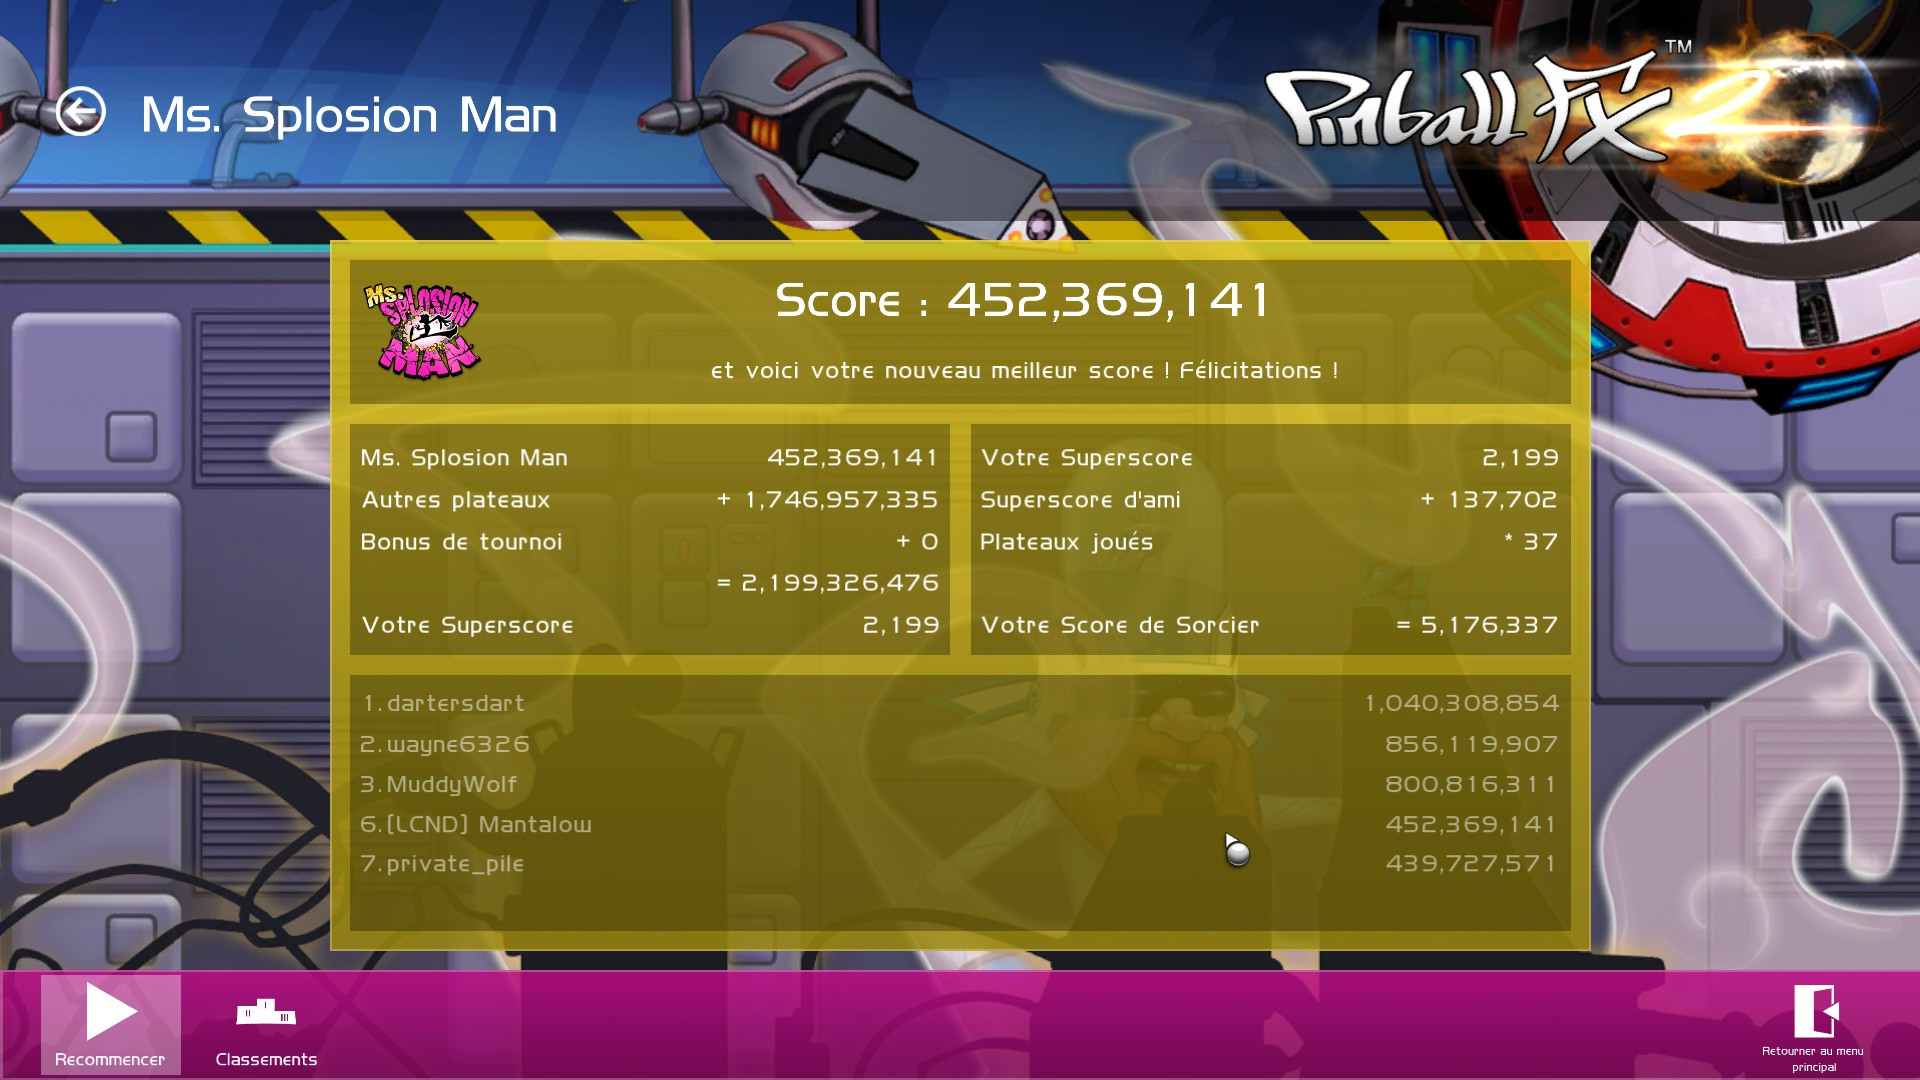 Mantalow: Pinball FX 2: Ms.